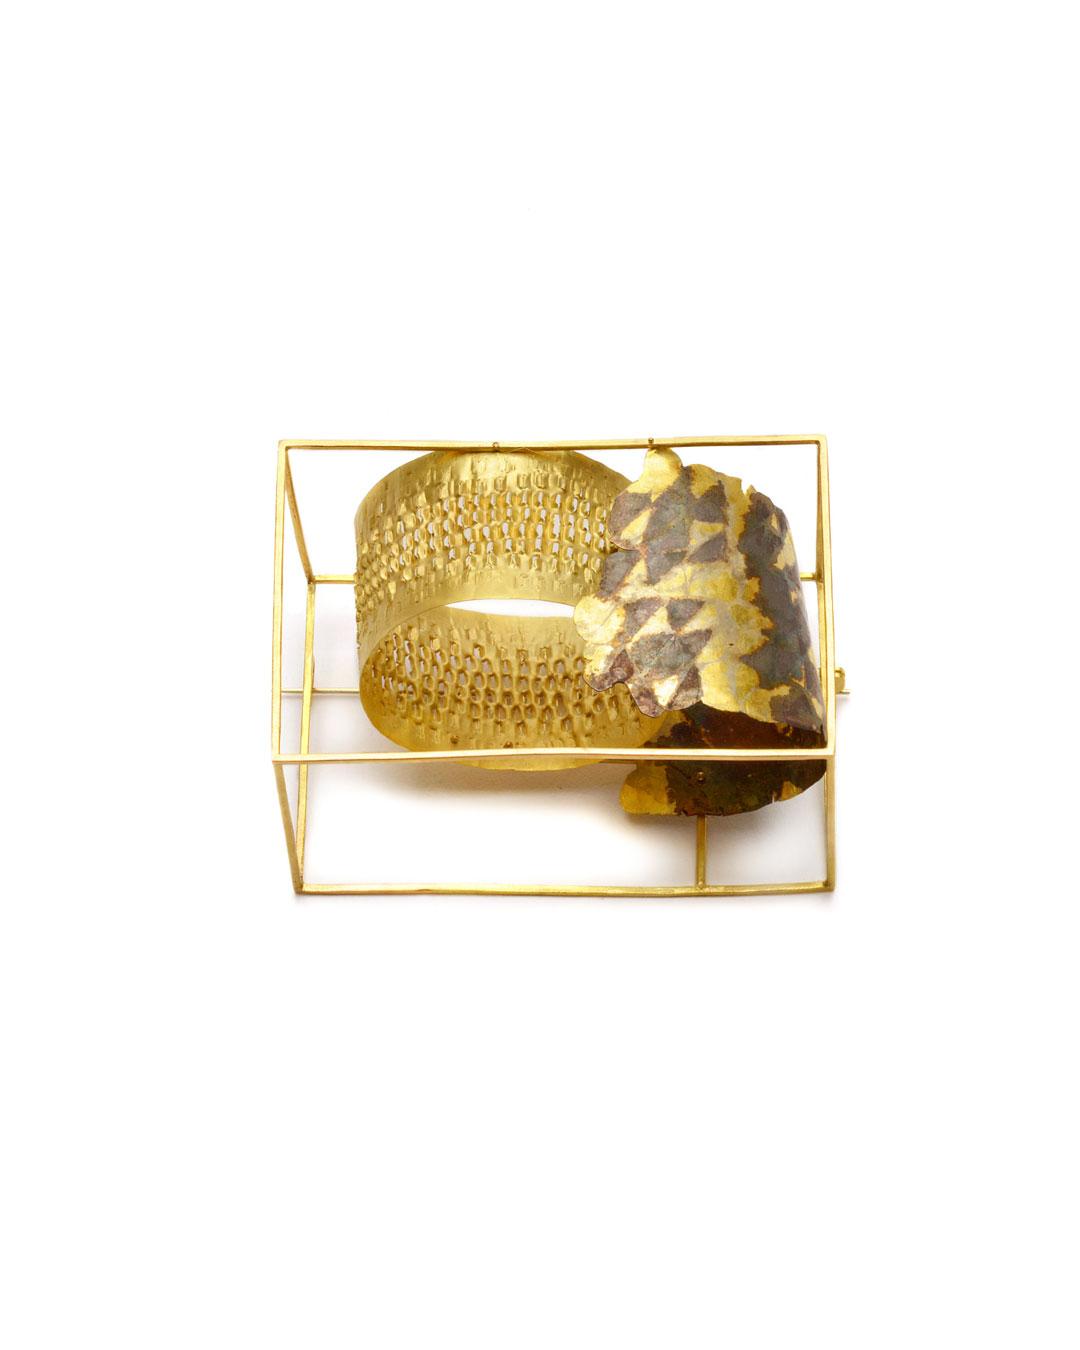 Stefano Marchetti, untitled, 2008, brooch; gold, silver, 71 x 50 x 36 mm, €8500